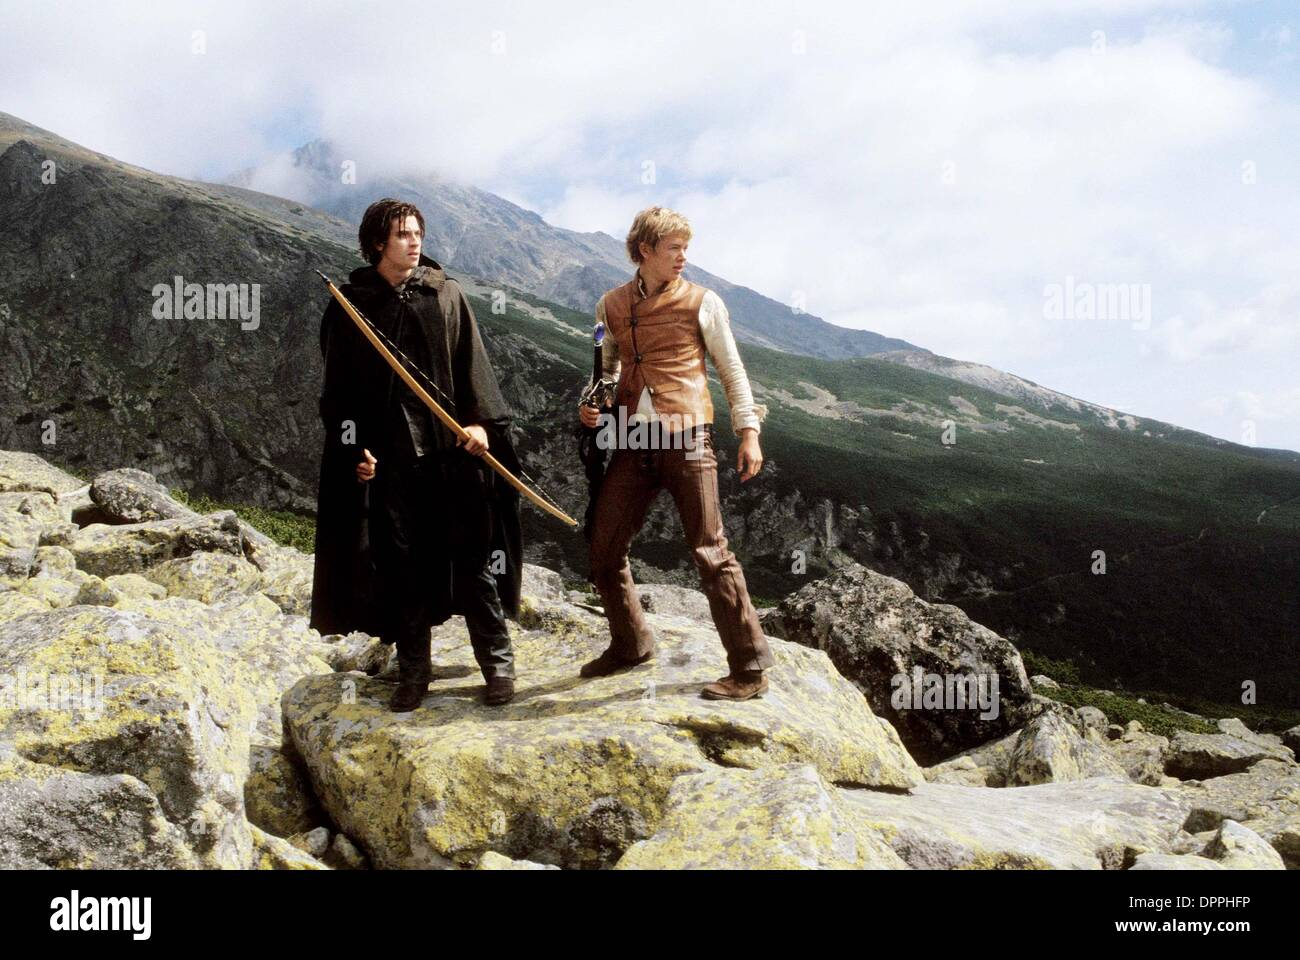 Nov. 27, 2006 - Murtagh (Garrett Hedlund) and Eragon (Ed Speleers) prepare for a momentous battle.    .K51219ES.'' Stock Photo